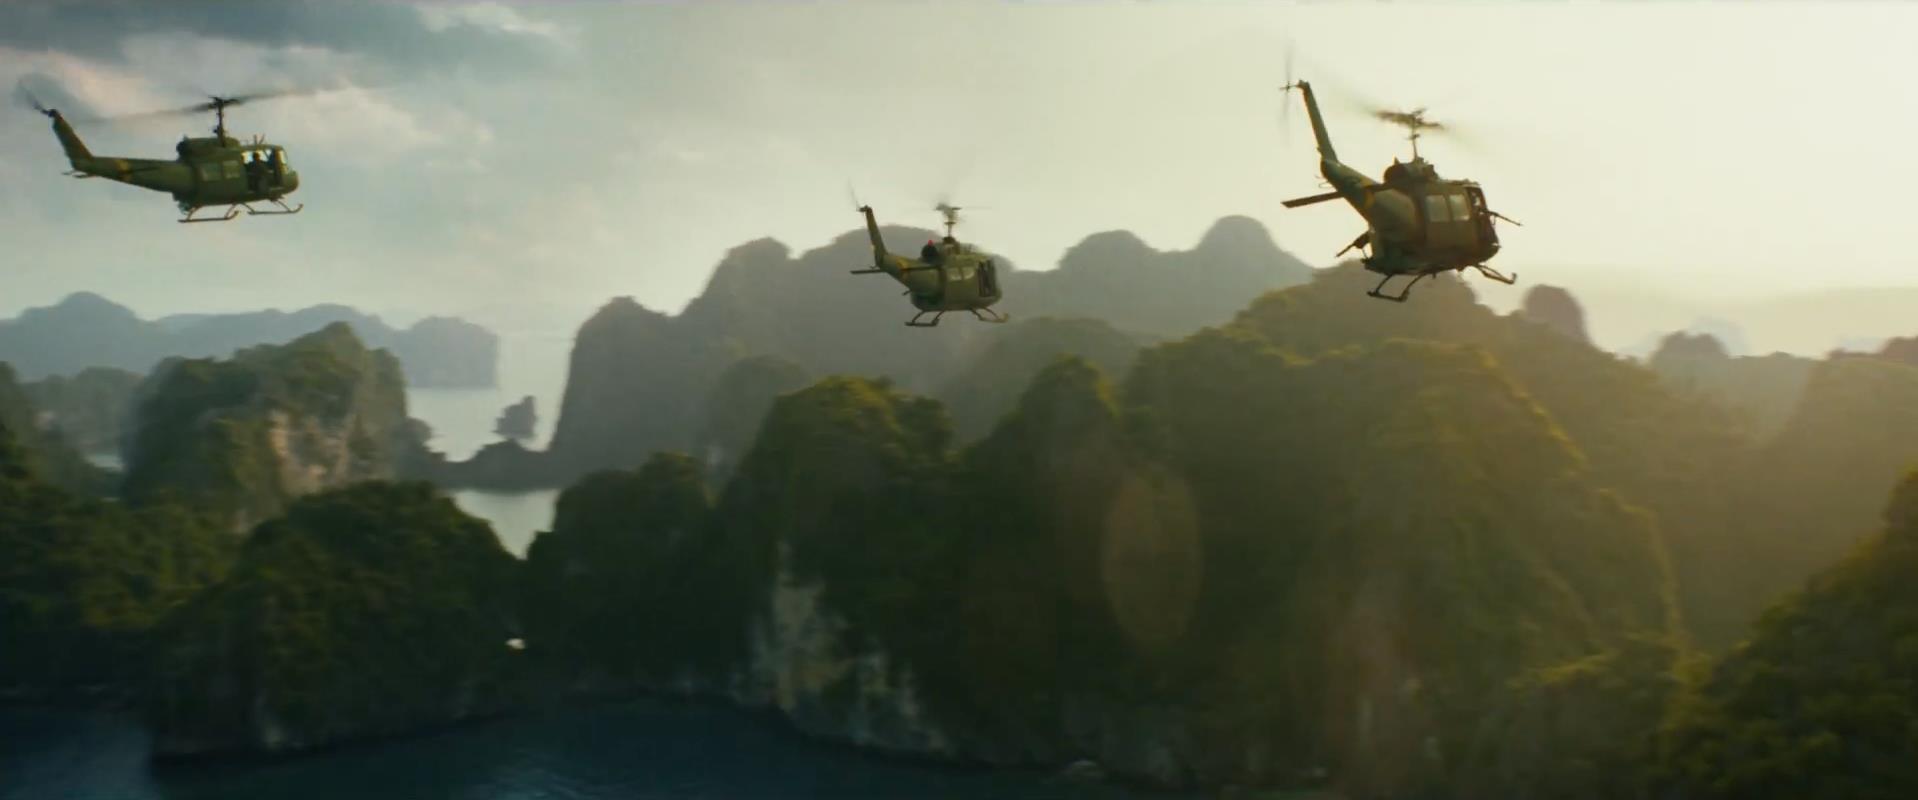 chiem-nguong-viet-nam-dep-me-hon-qua-cac-dia-diem-quay-phim-Kong-Skull-Island-ivivu-11